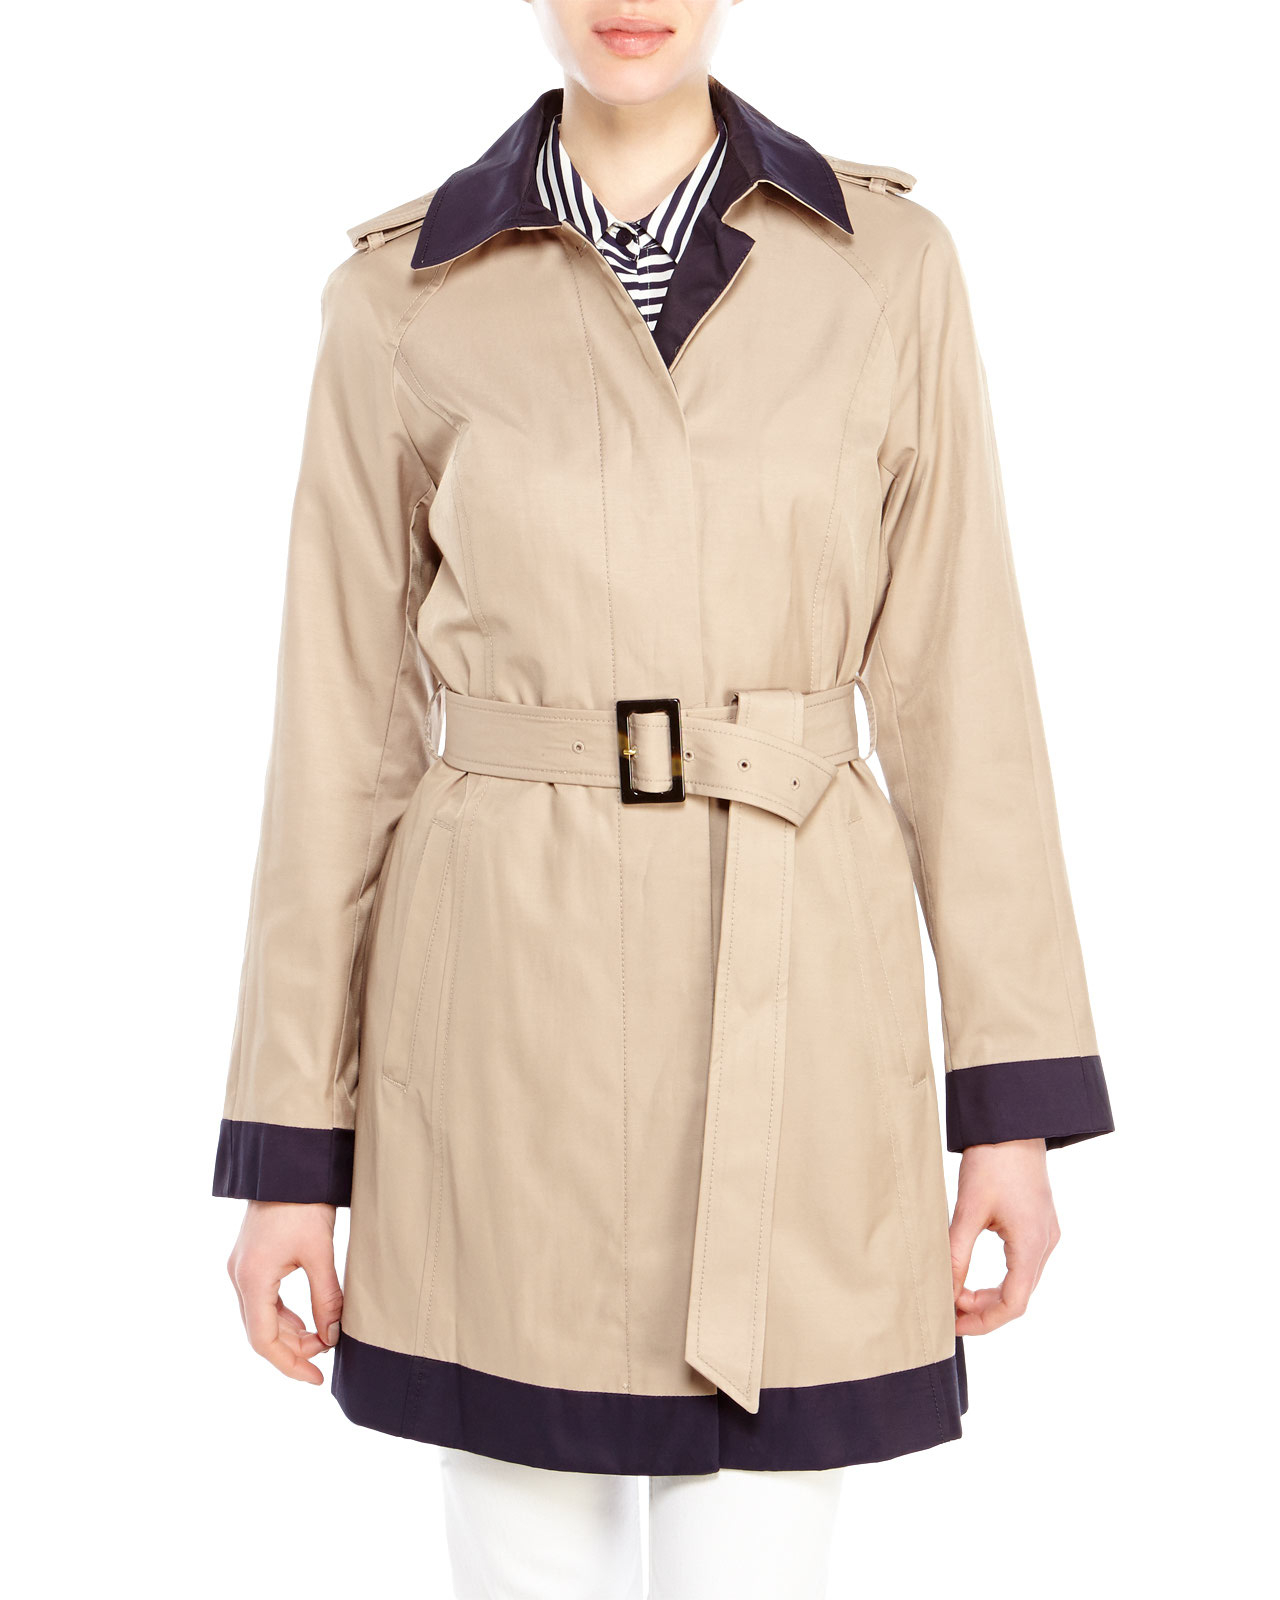 Sale victoria's secret Short Sleeve Belted Button Up Midi Dress ebay donation centers